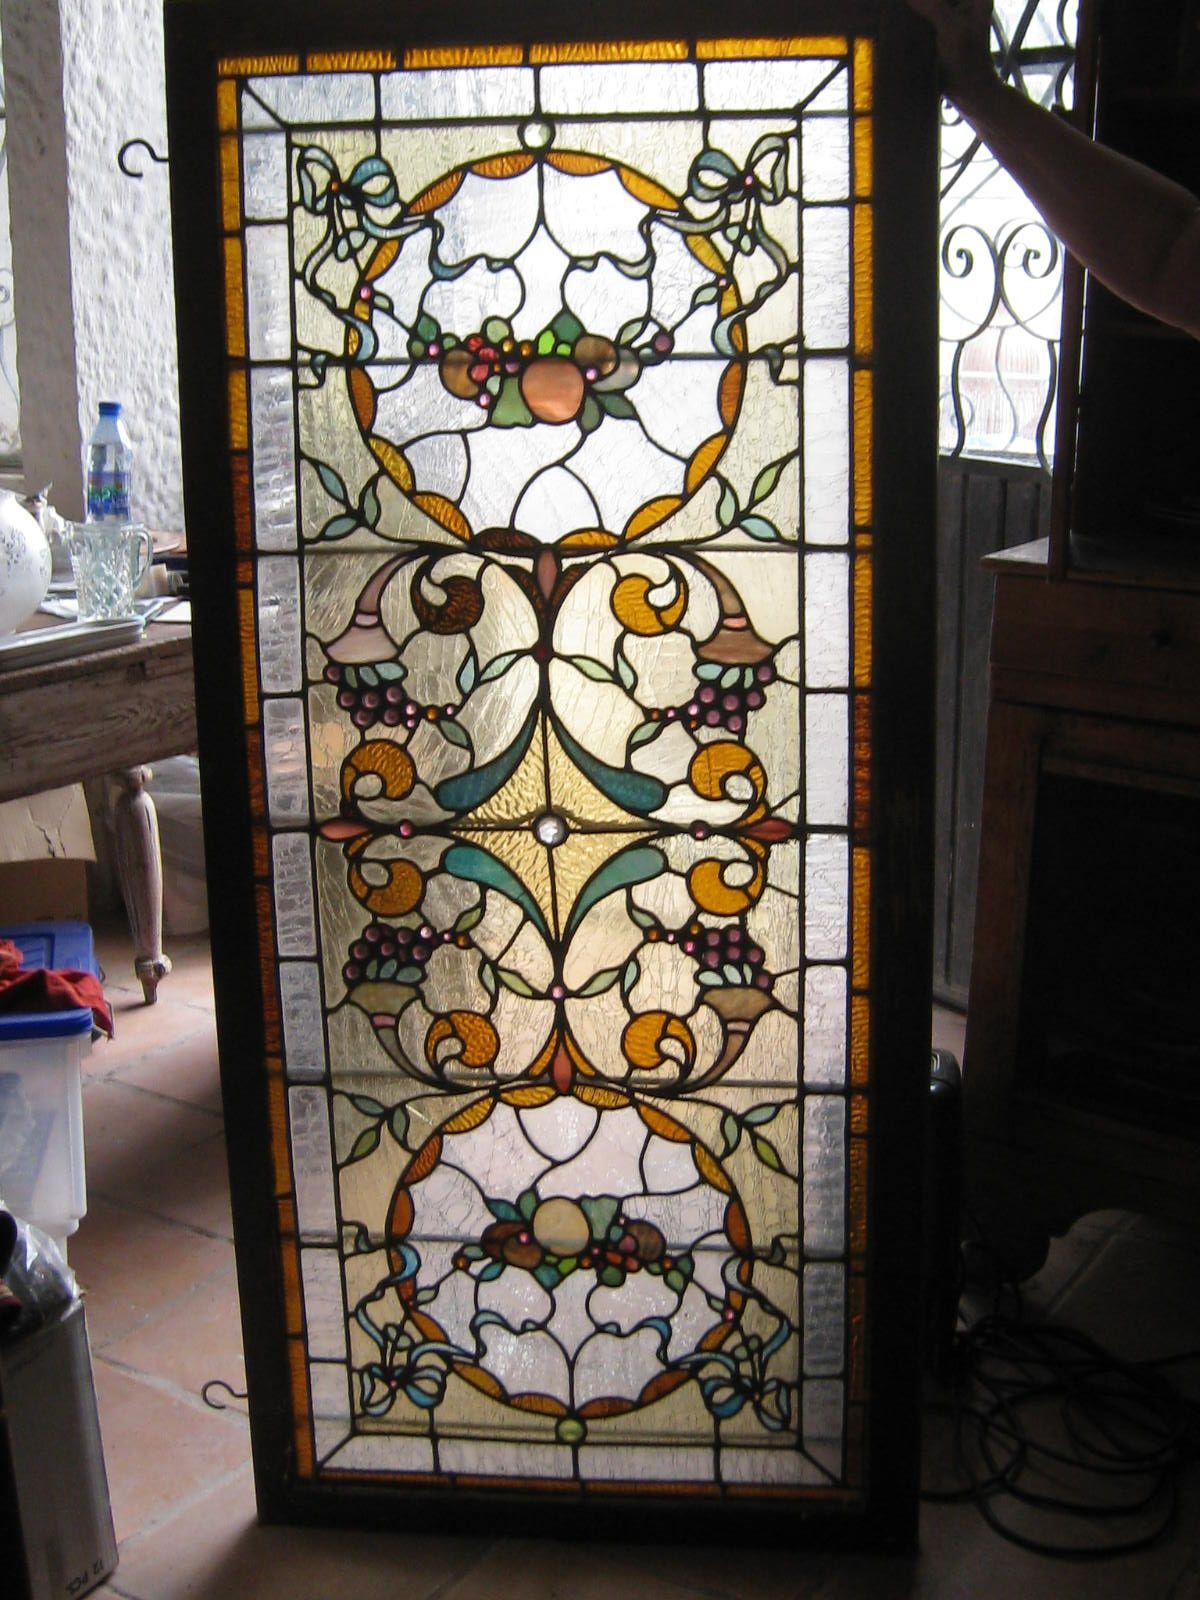 Stained Glass Art Stained Glass Door Stained Glass Art Stained Glass Panel